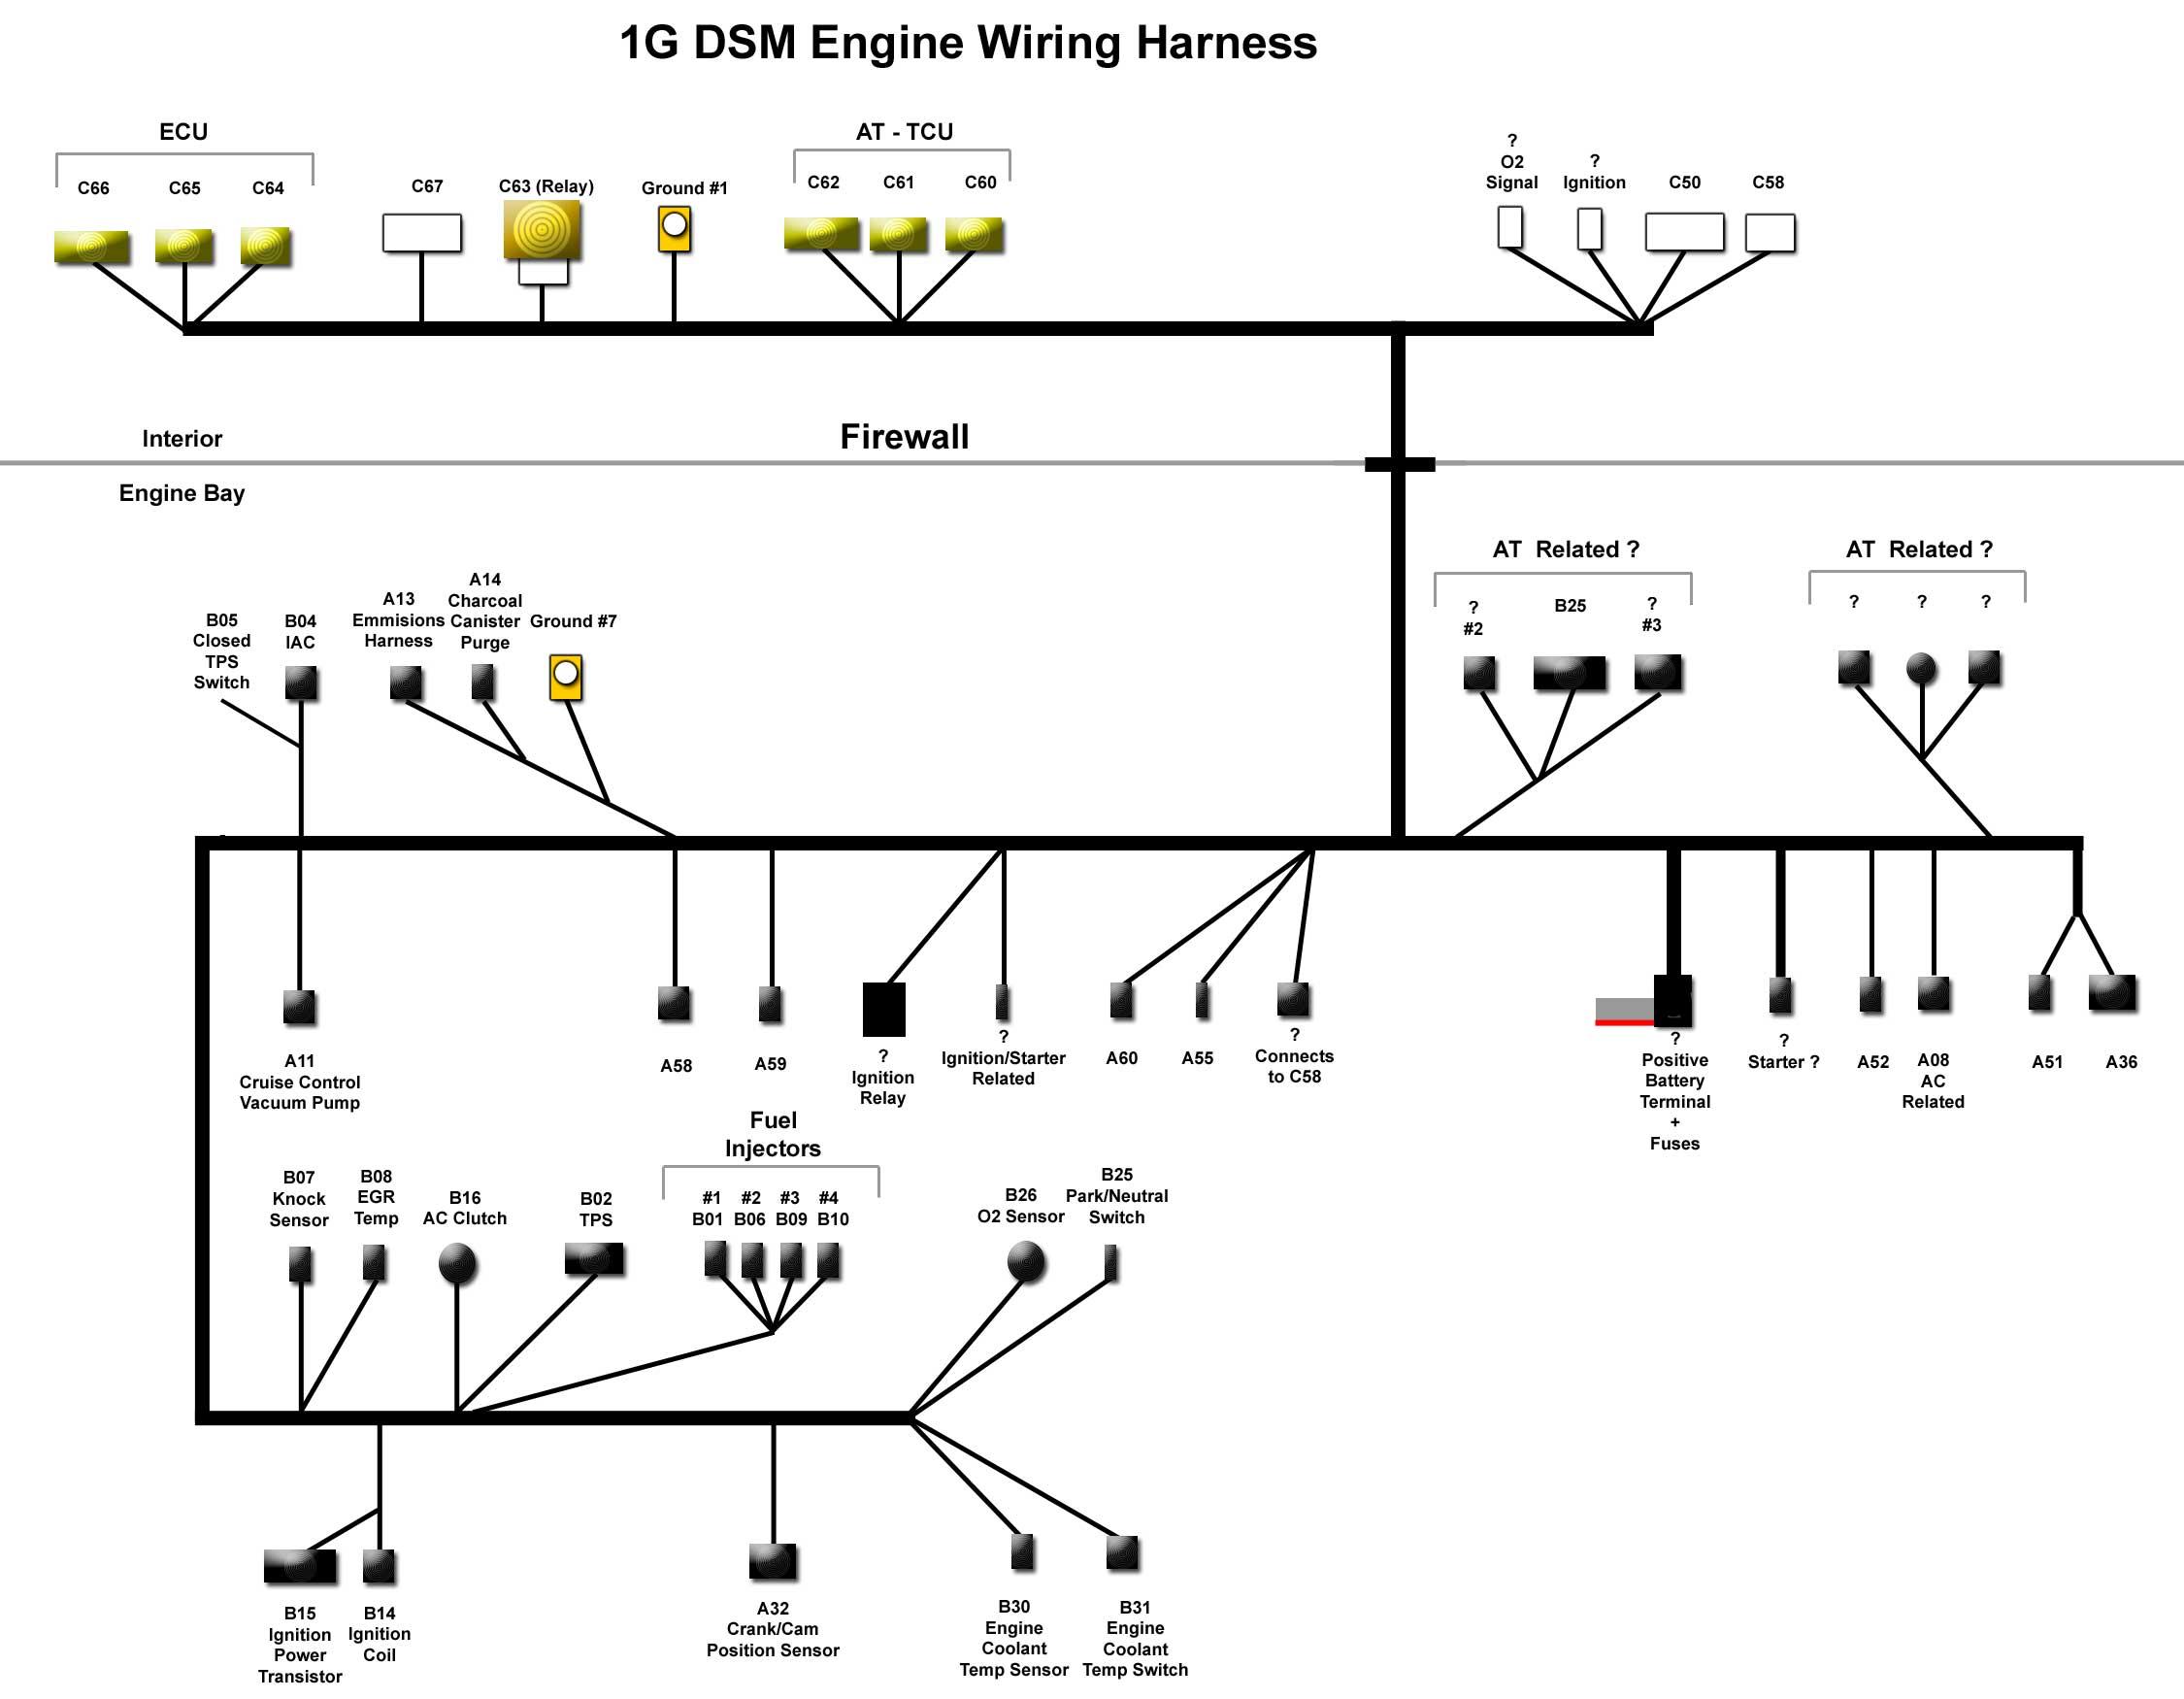 1G DSM EngineHarness?resize=665%2C517 4g63 ecu wiring diagram the best wiring diagram 2017 1g dsm wiring harness diagram at soozxer.org